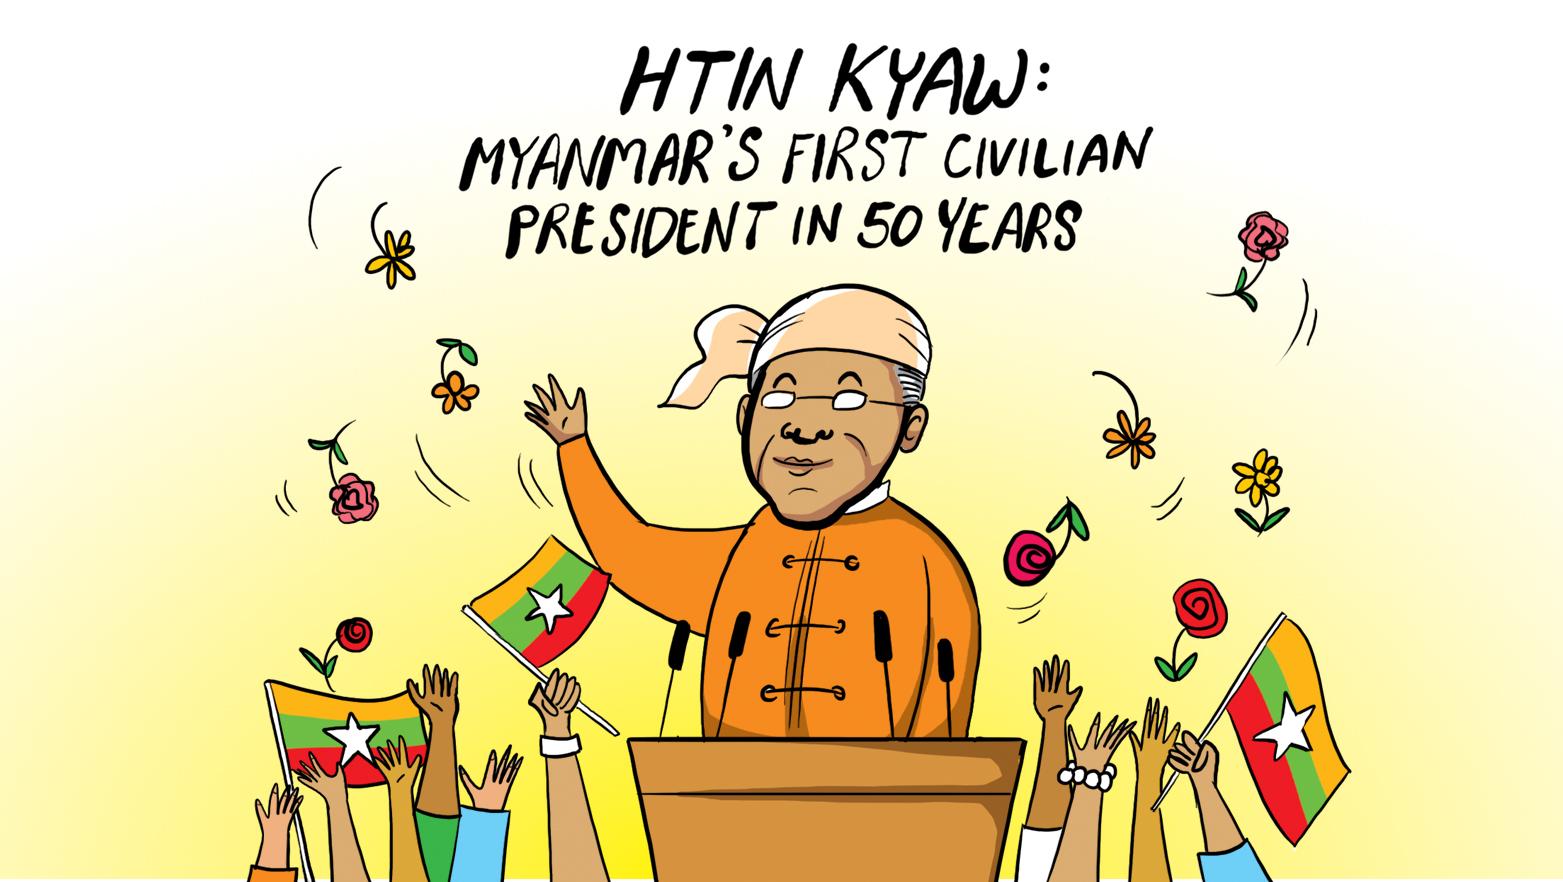 Htin Kyaw: Myanmar's first civilian president in 50 years